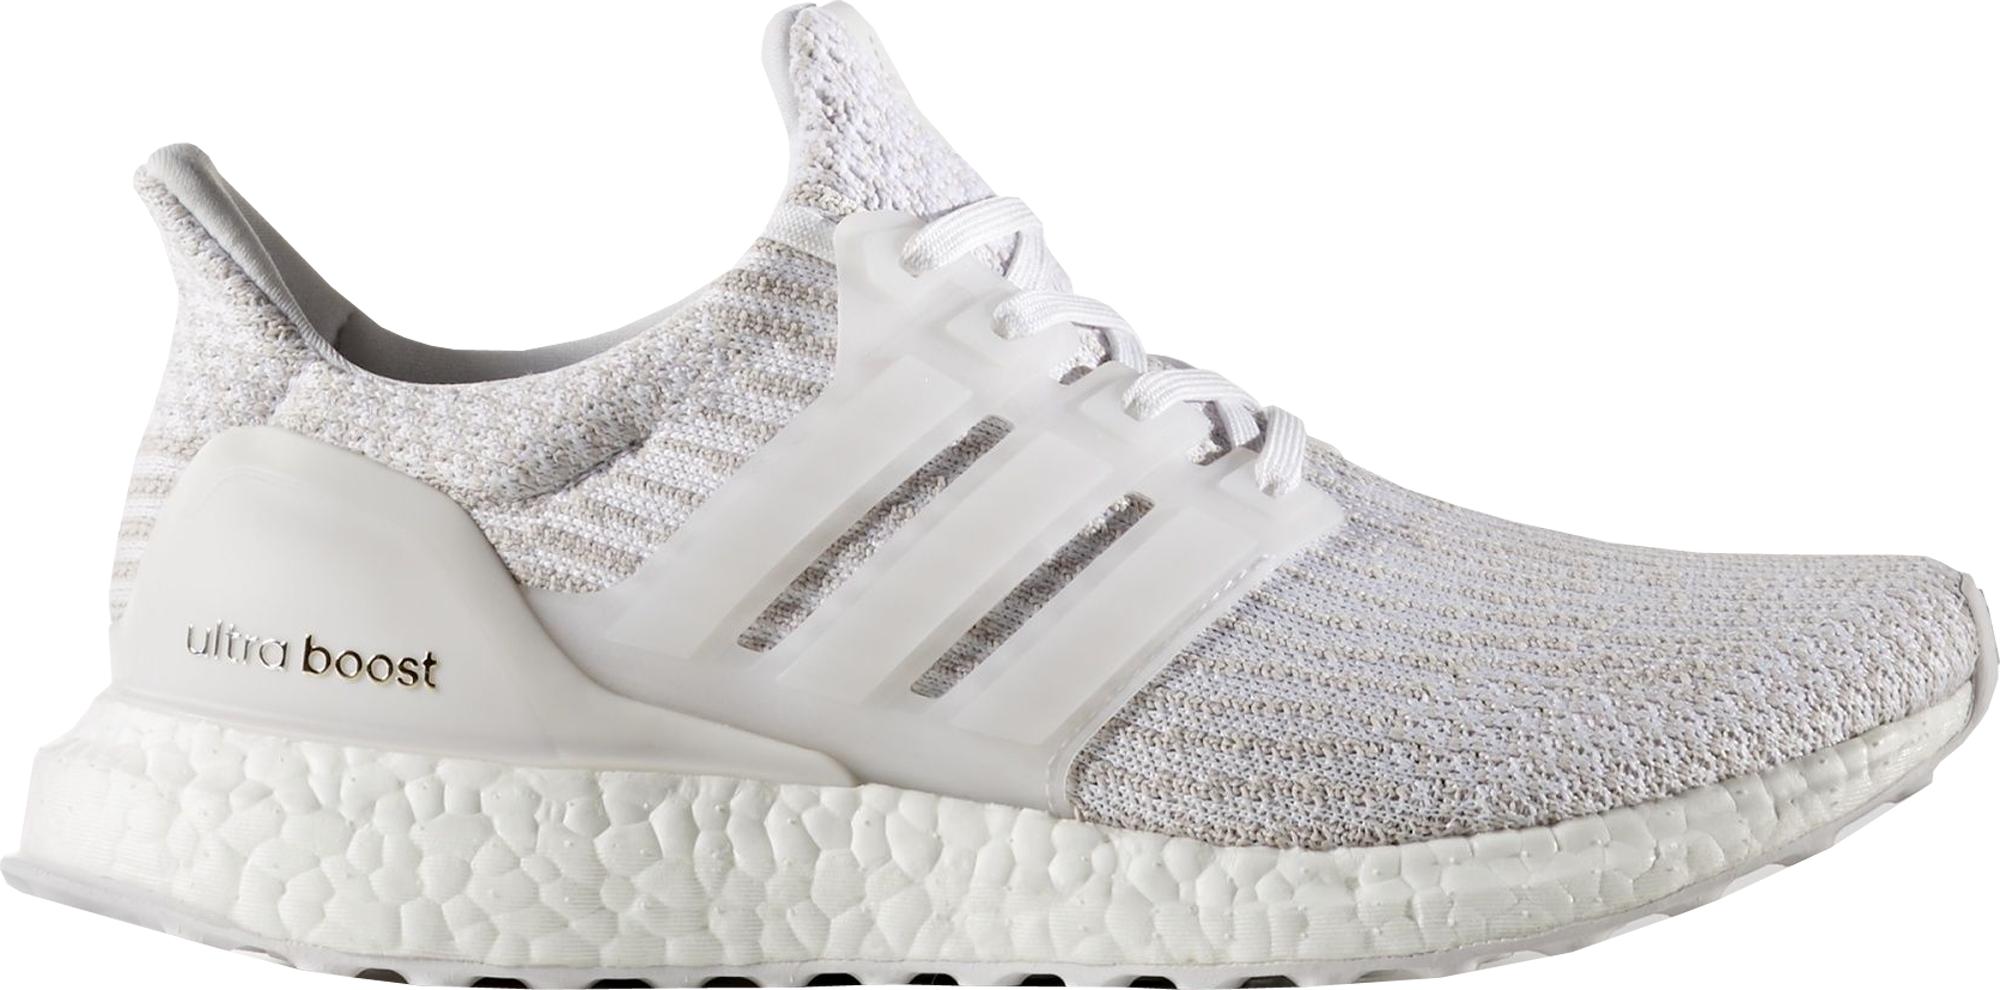 adidas Ultra Boost 3.0 White Pearl Grey